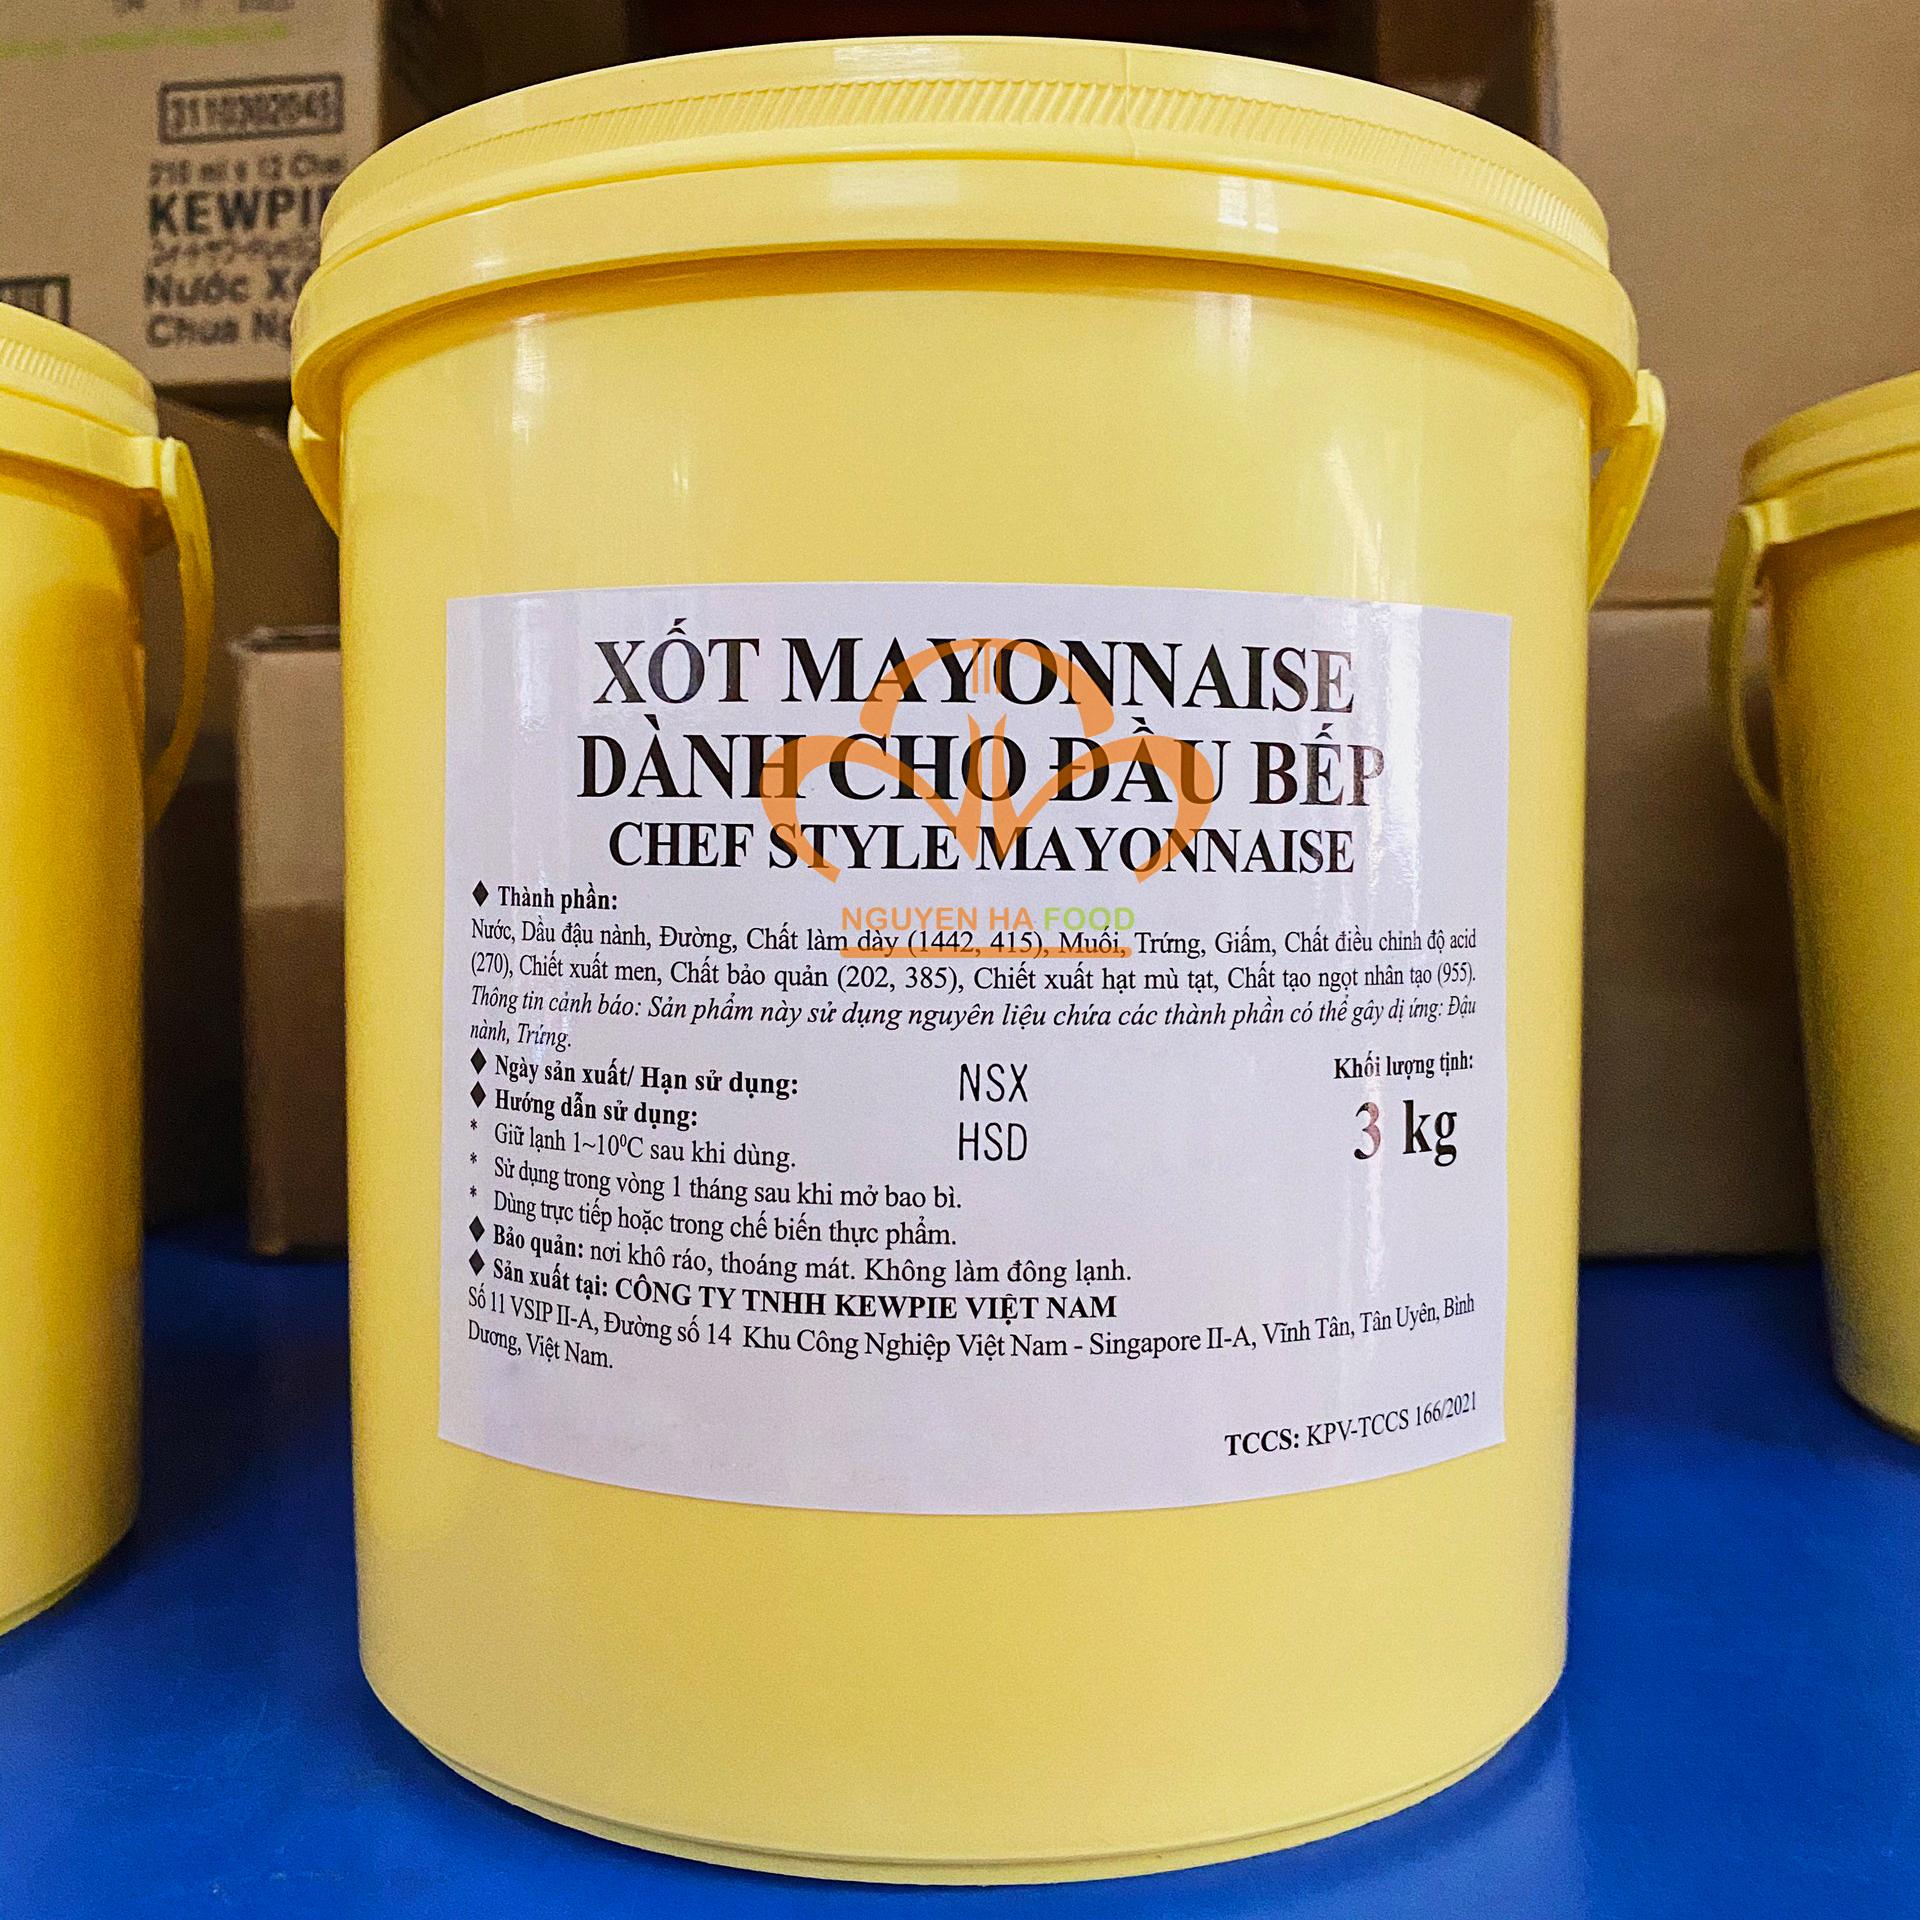 XOT MAYONNAISE KEWPIE DANH CHO DAU BEP - CHEF STYLE MAYONNAISE - NGUYEN HA FOOD  (4)